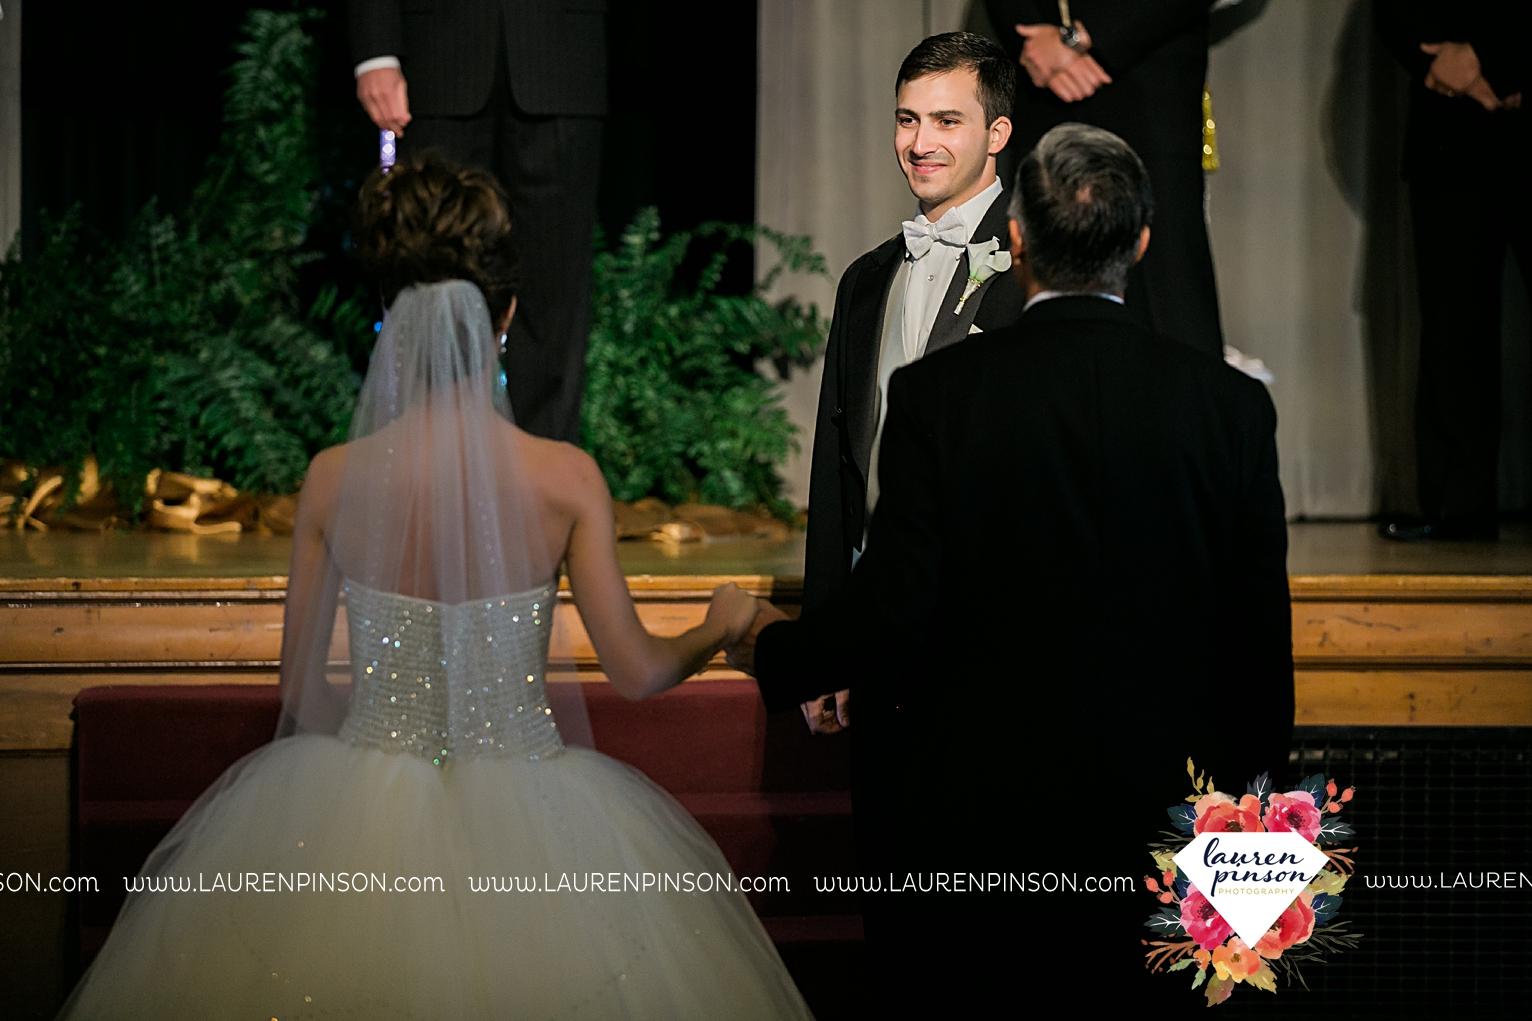 wichita-falls-texas-wedding-photographer-the-forum-by-the-kemp-mayfield-events-ulta-gold-glitter_2862.jpg